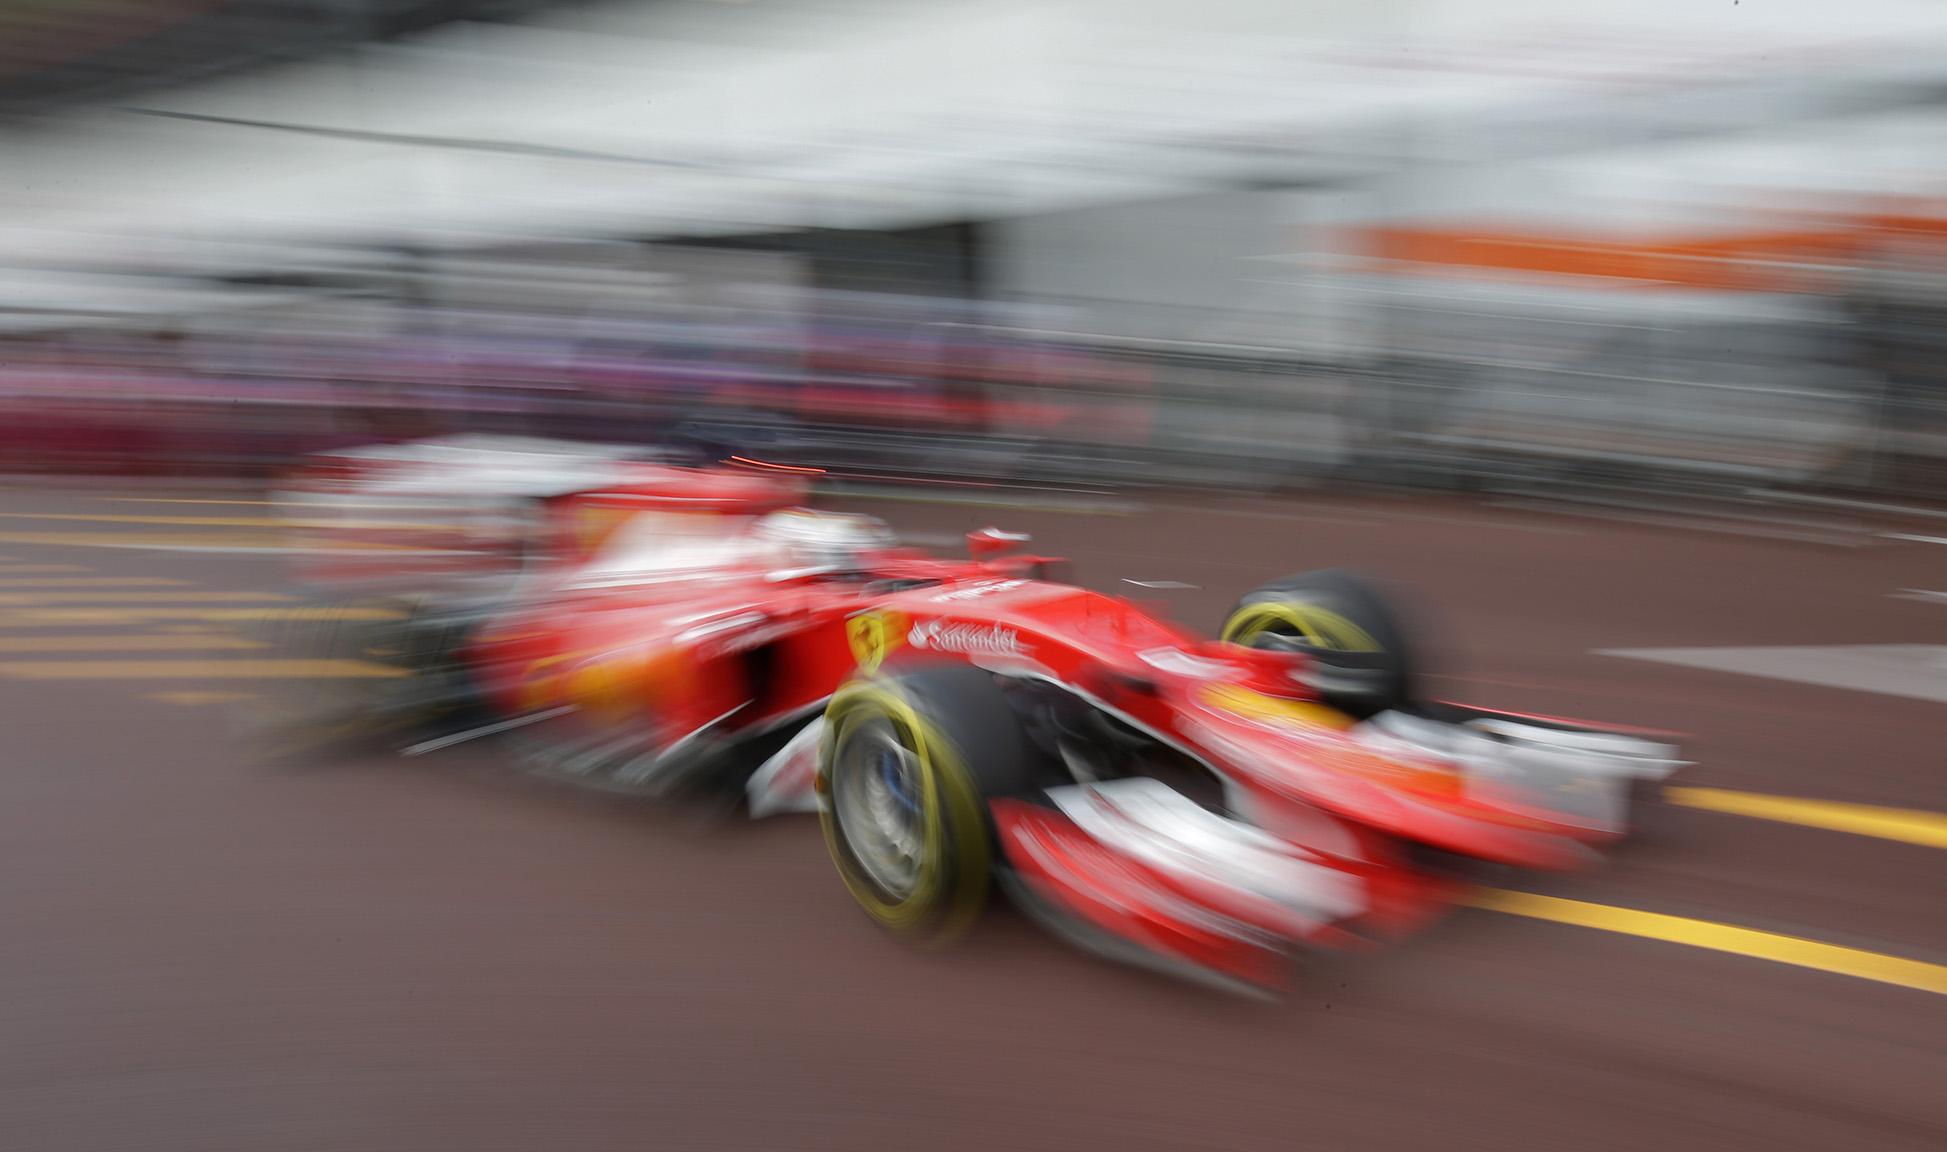 Formula One - F1 - Monaco Grand Prix 2015 - Circuit de Monaco, Monte Carlo - 21/5/15 Sebastian Vettel of Ferrari during practice Reuters / Max Rossi